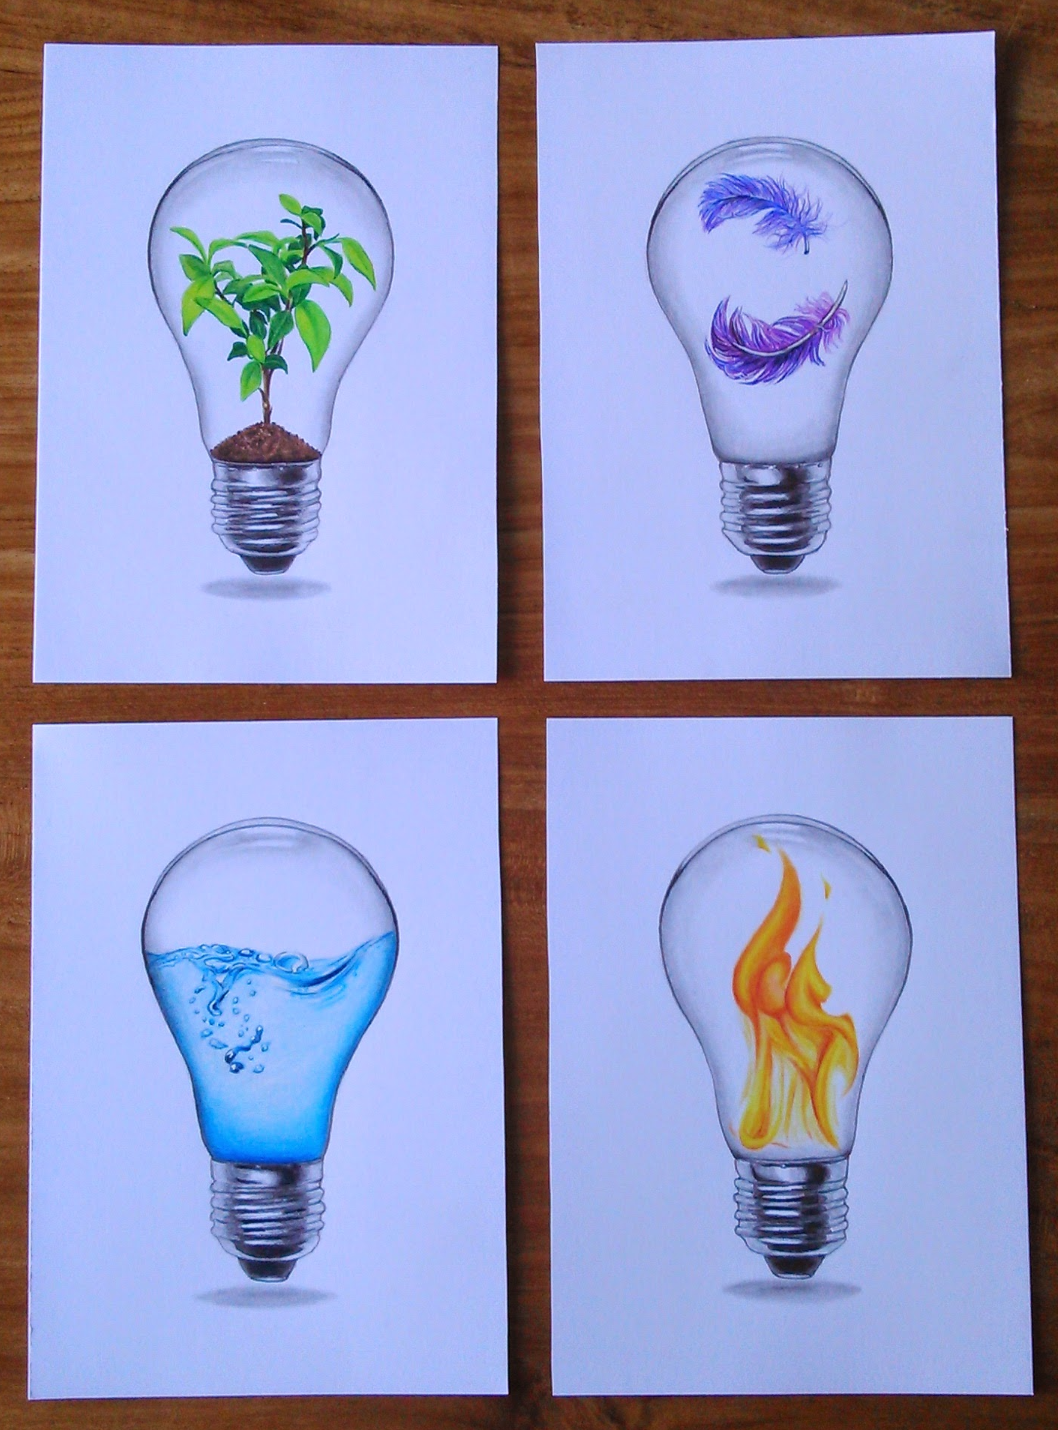 4 elements lights